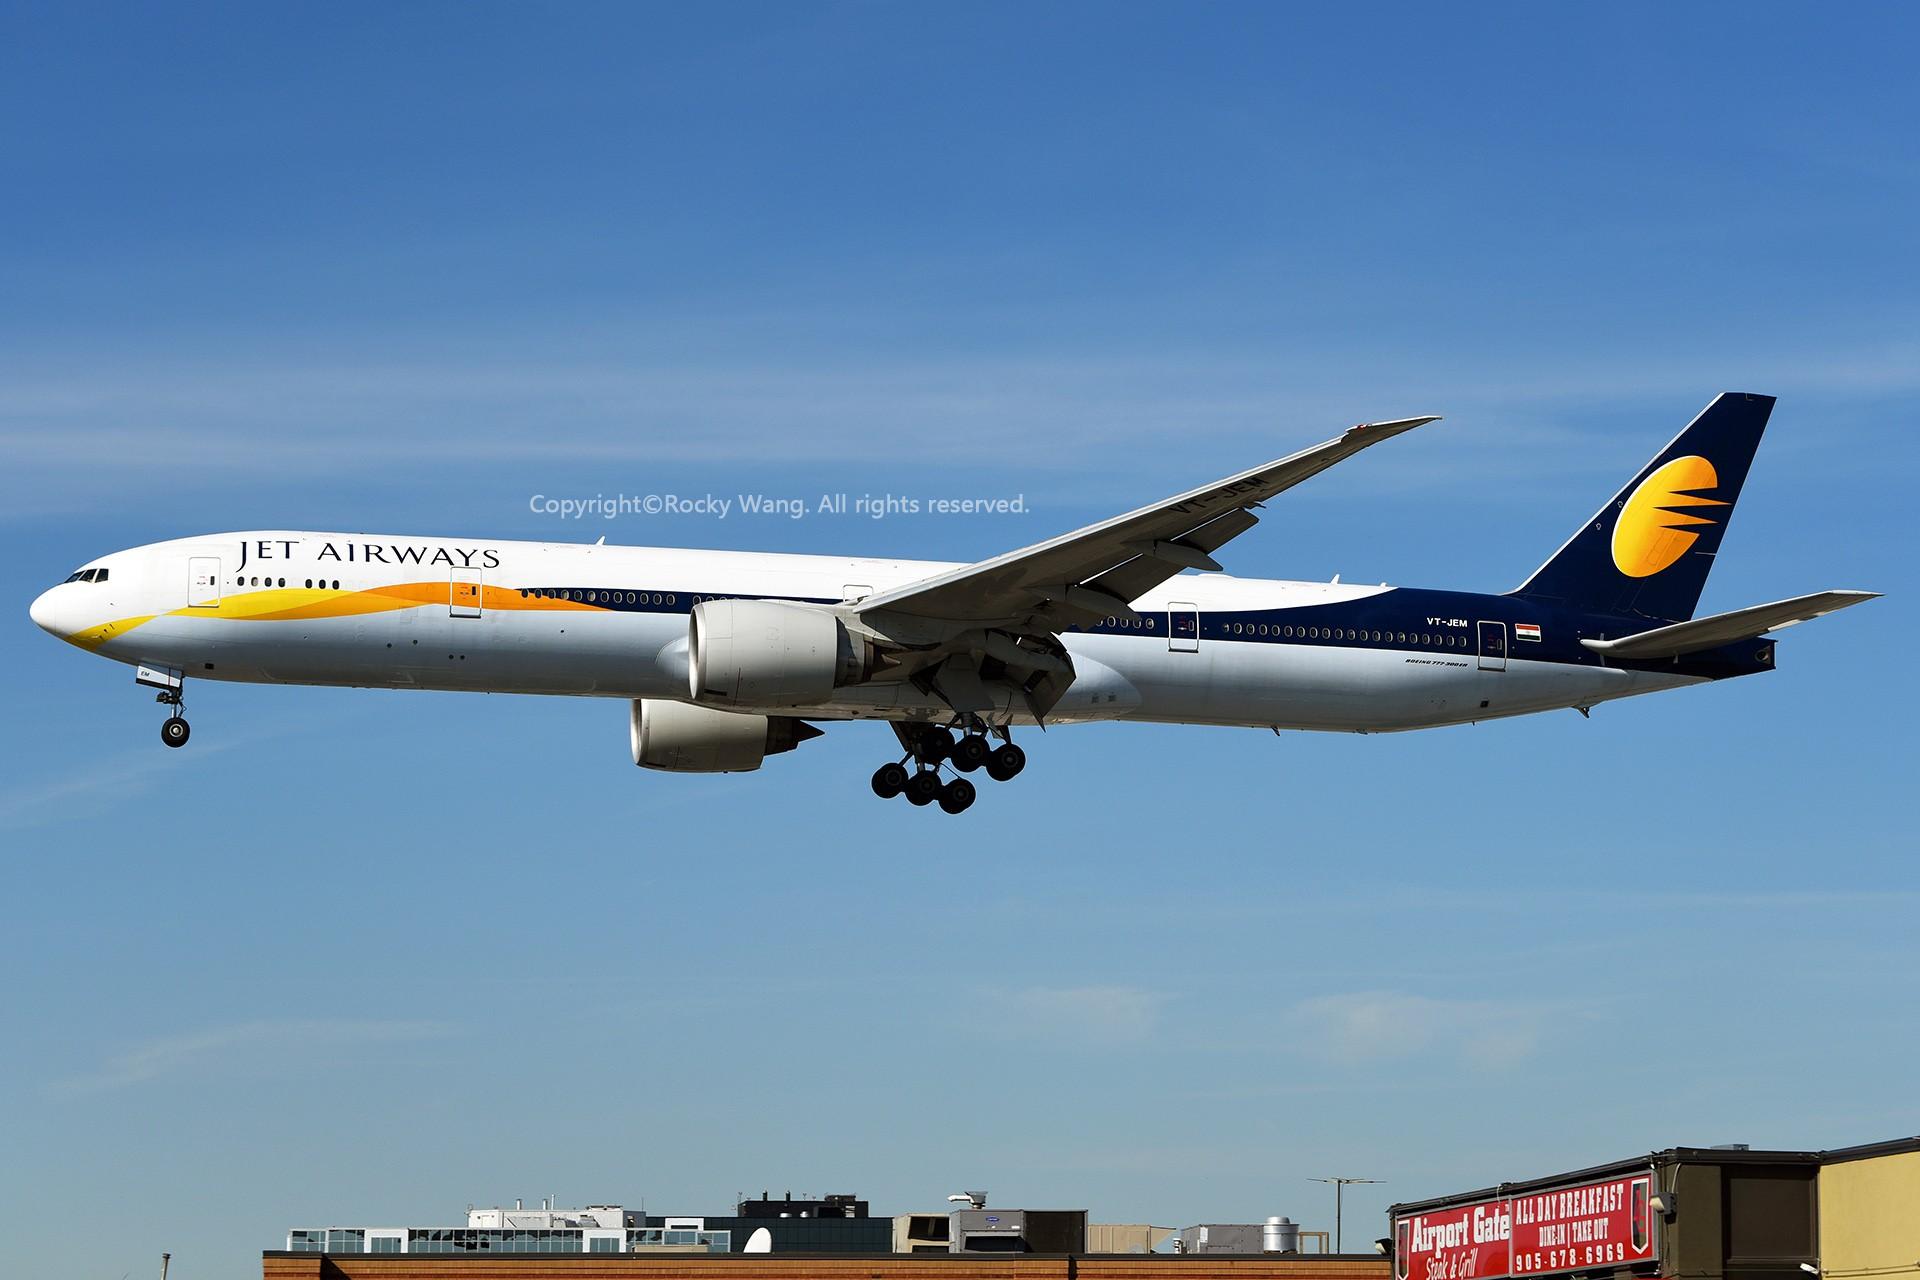 Re:[原创]CYYZ 30图 BOEING 777-35RER VT-JEM Toronto Lester B. Pearson Int'l Airport